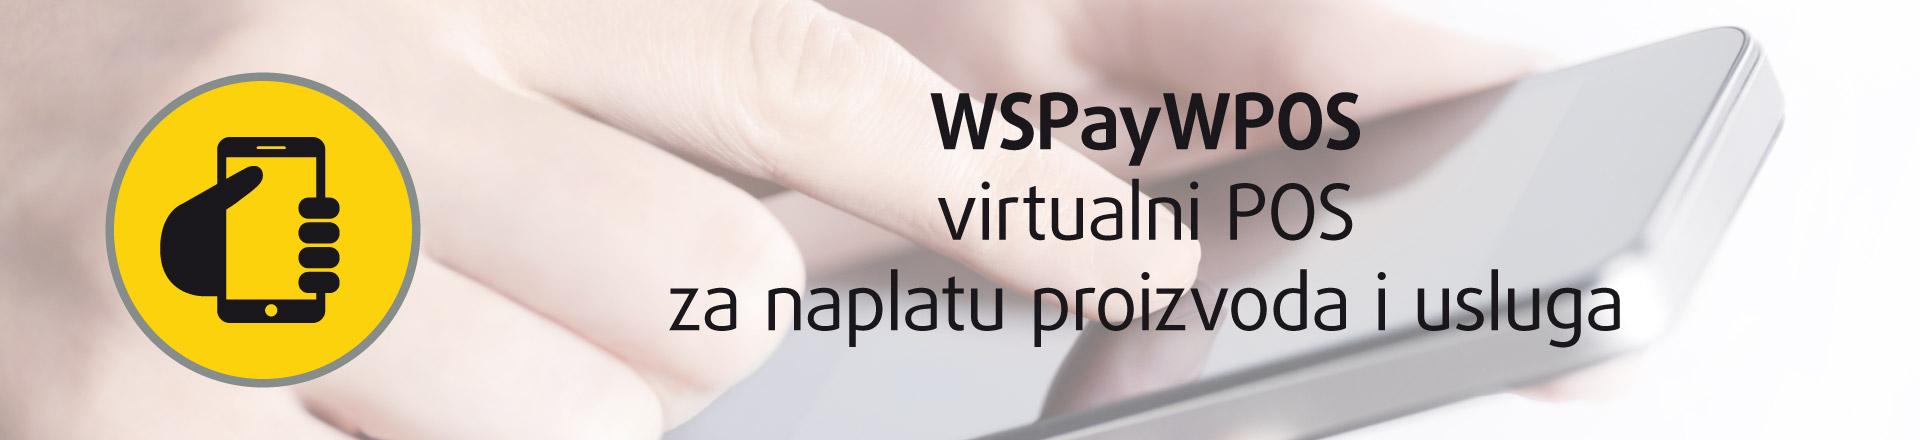 https://www.wspay.info/Repository/Banners/WSPayWPOS-1920x440.jpg